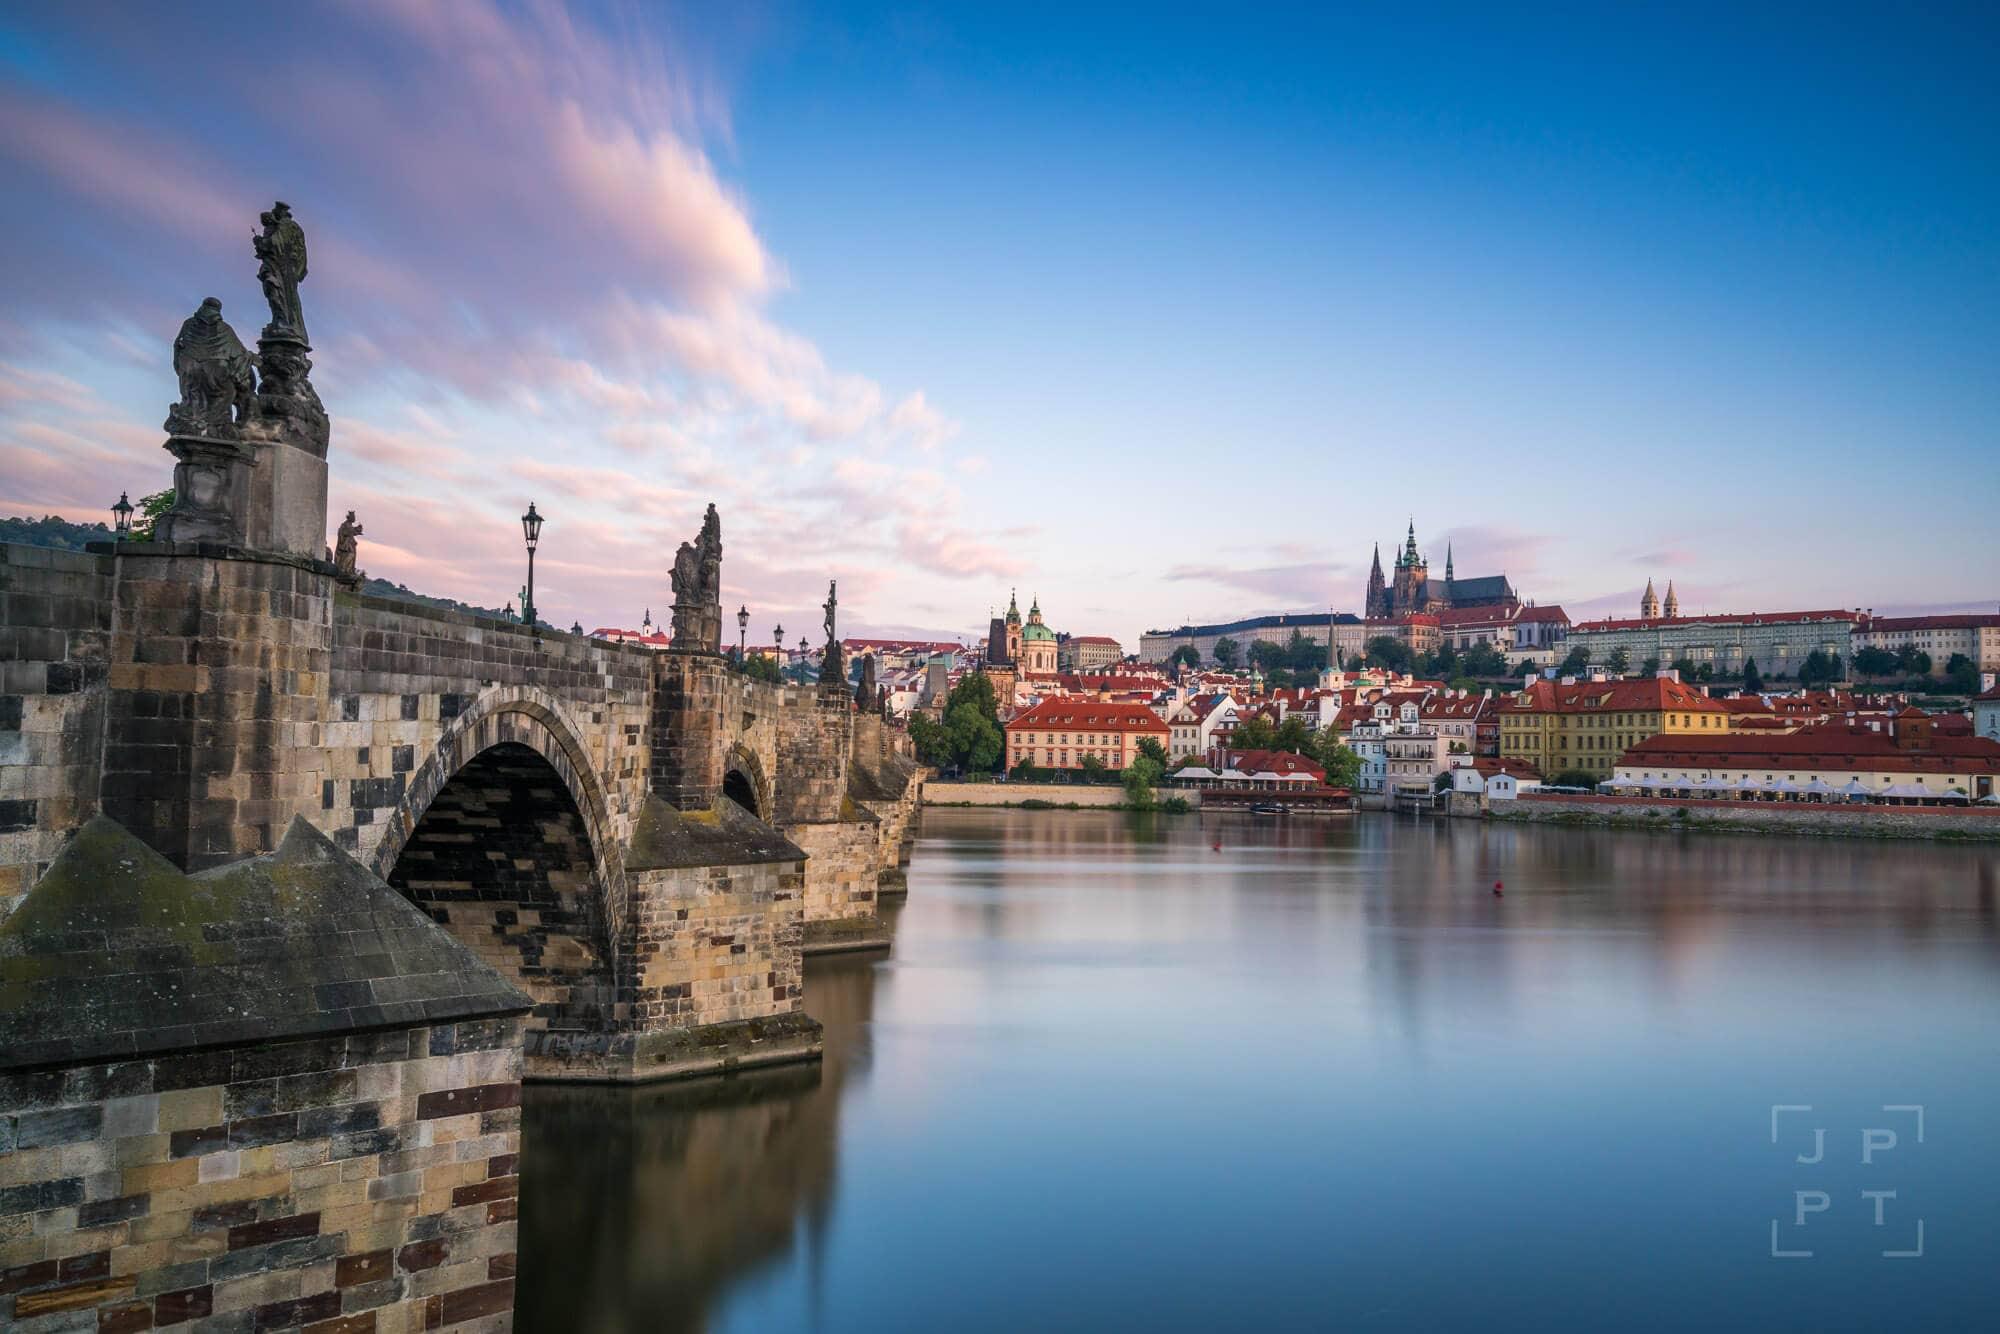 Charles bridge and Prague castle at sunrise